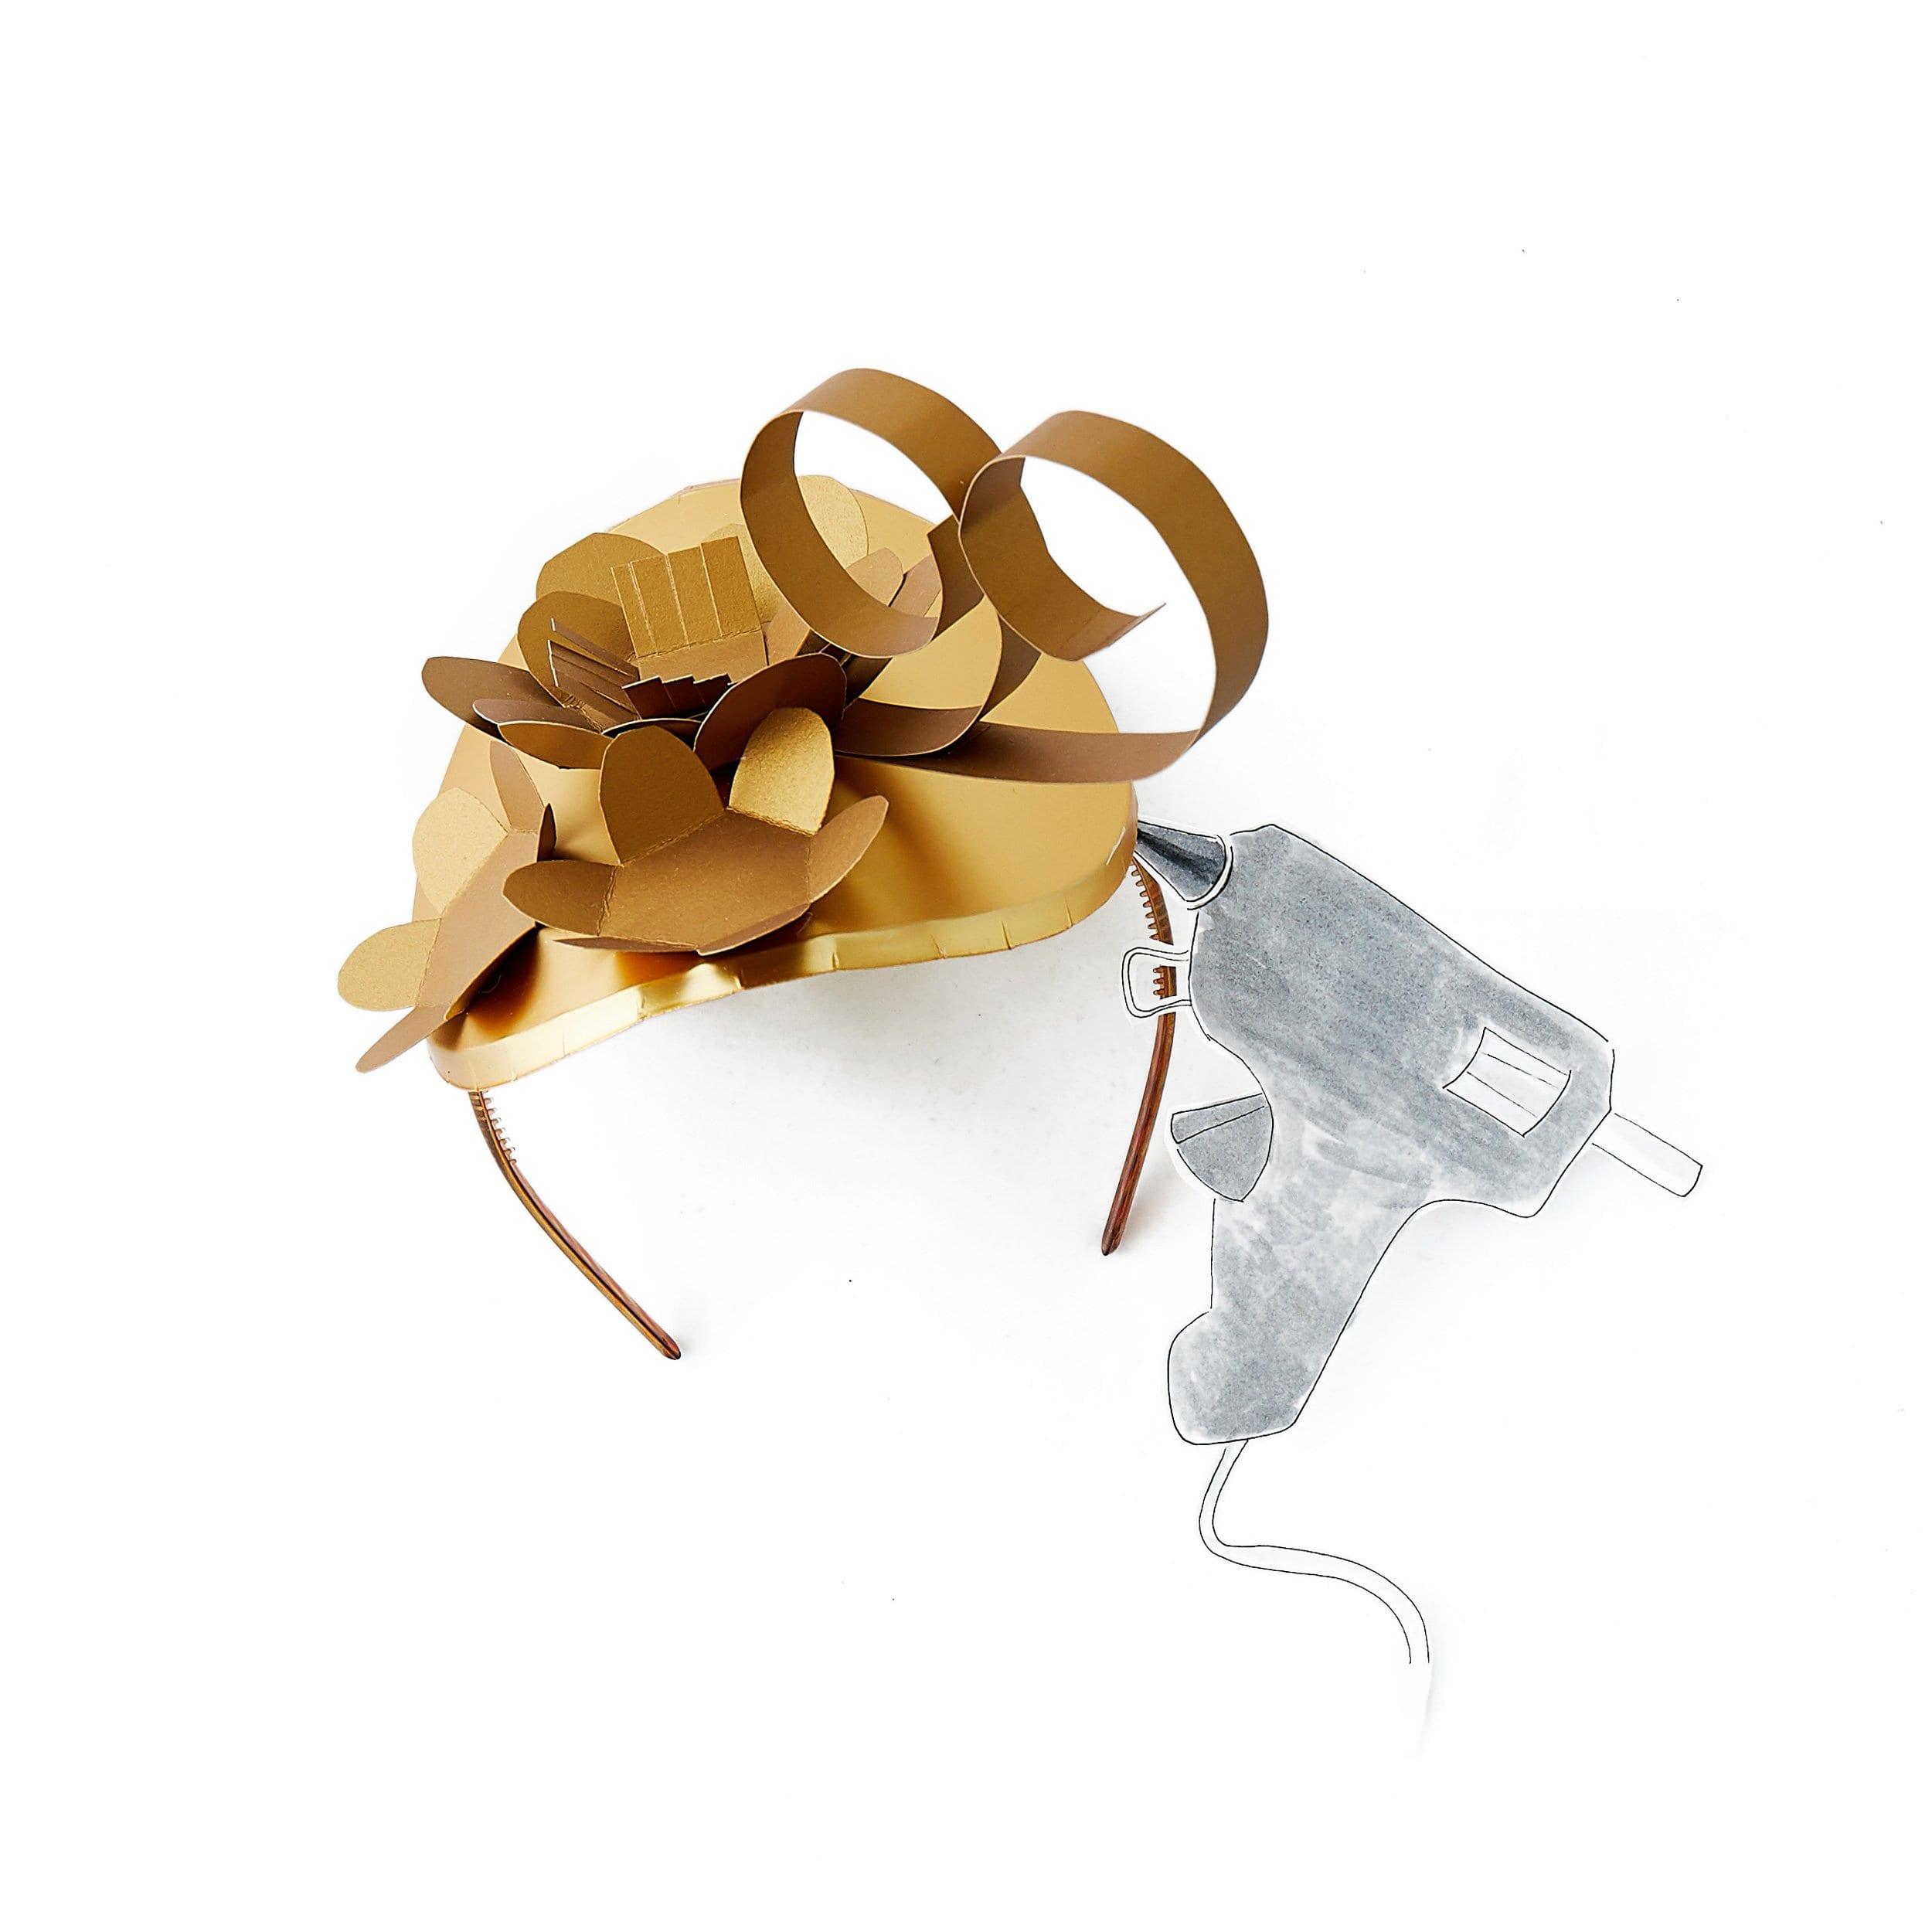 Kentucky Derby, Royal Wedding, paper hat, bridal shower, craft bar, paper craft, diy accessories, wedding craft